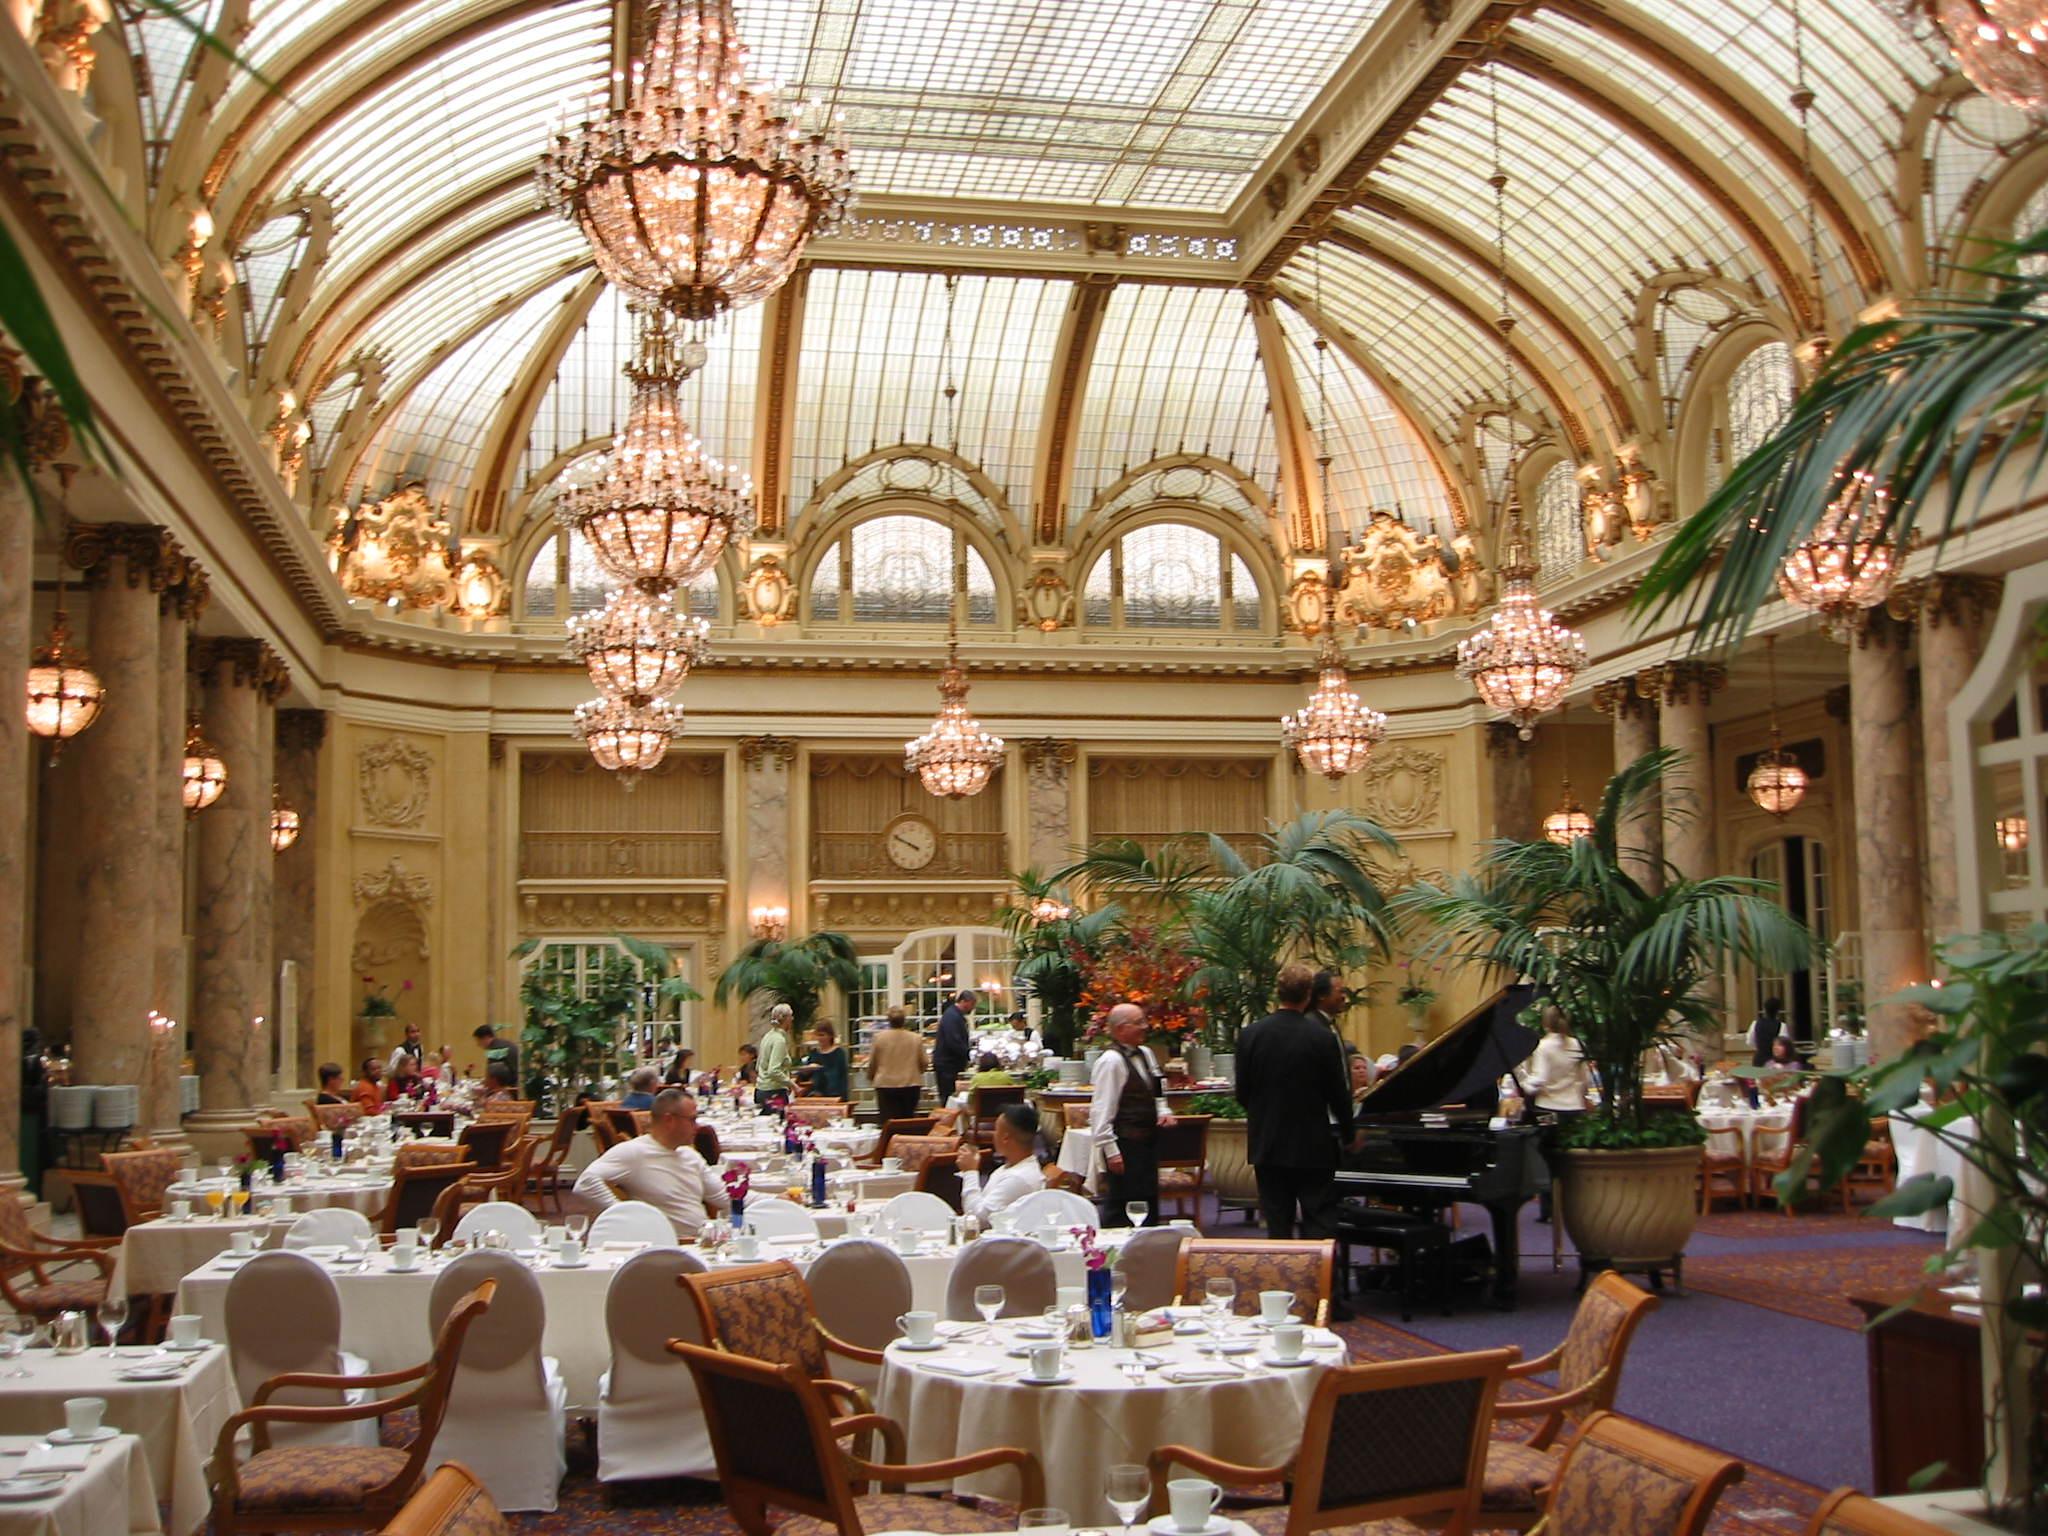 Garden Court, Palace Hotel